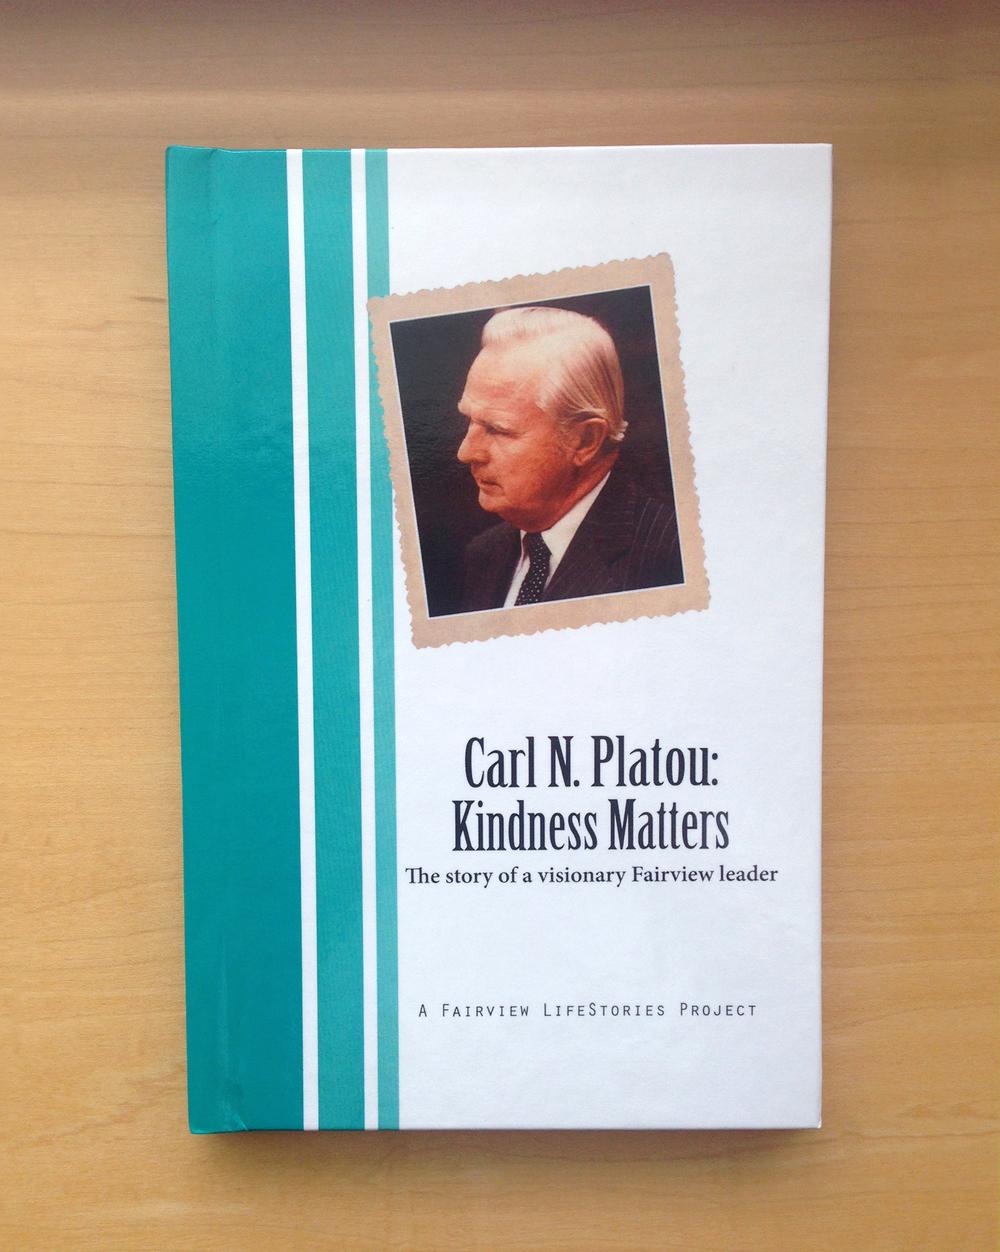 Carl N. Platou: Kindness Matters